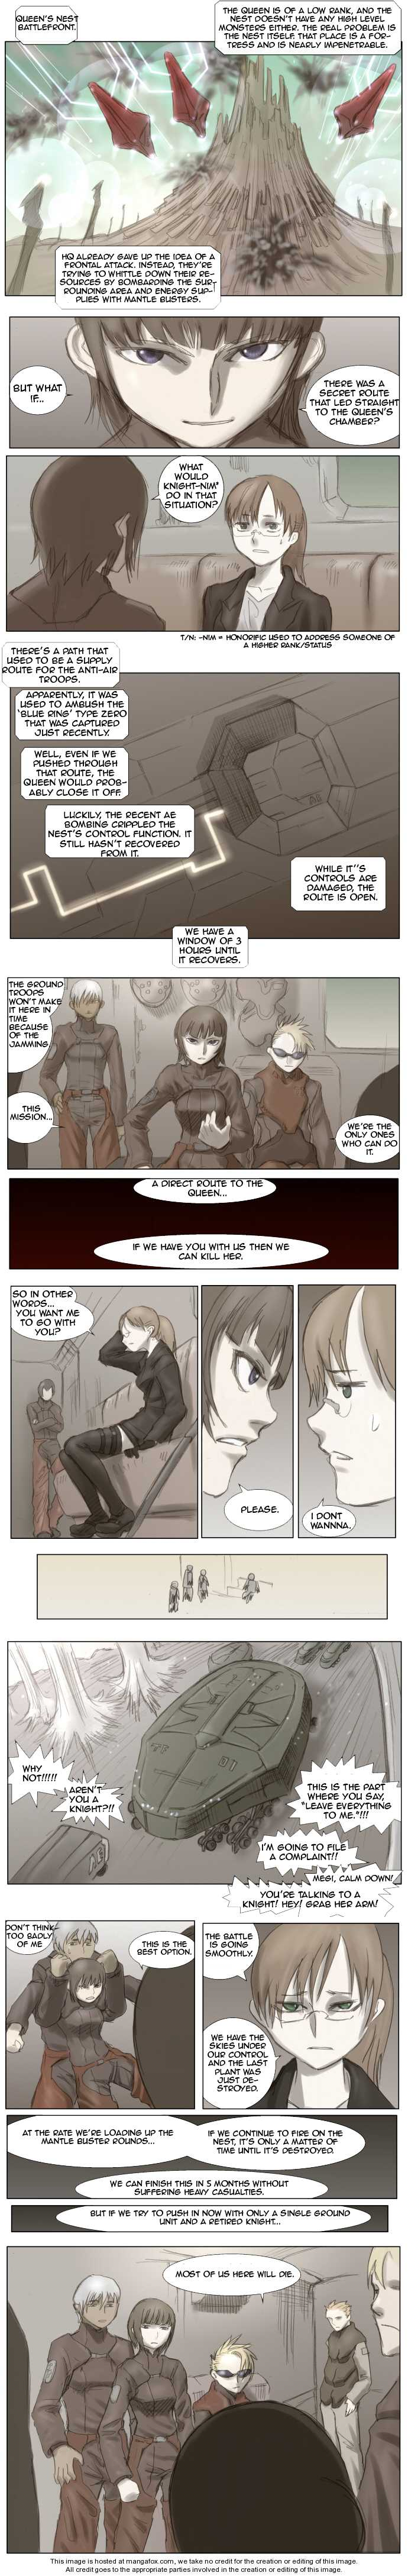 Knight Run 2 Page 1